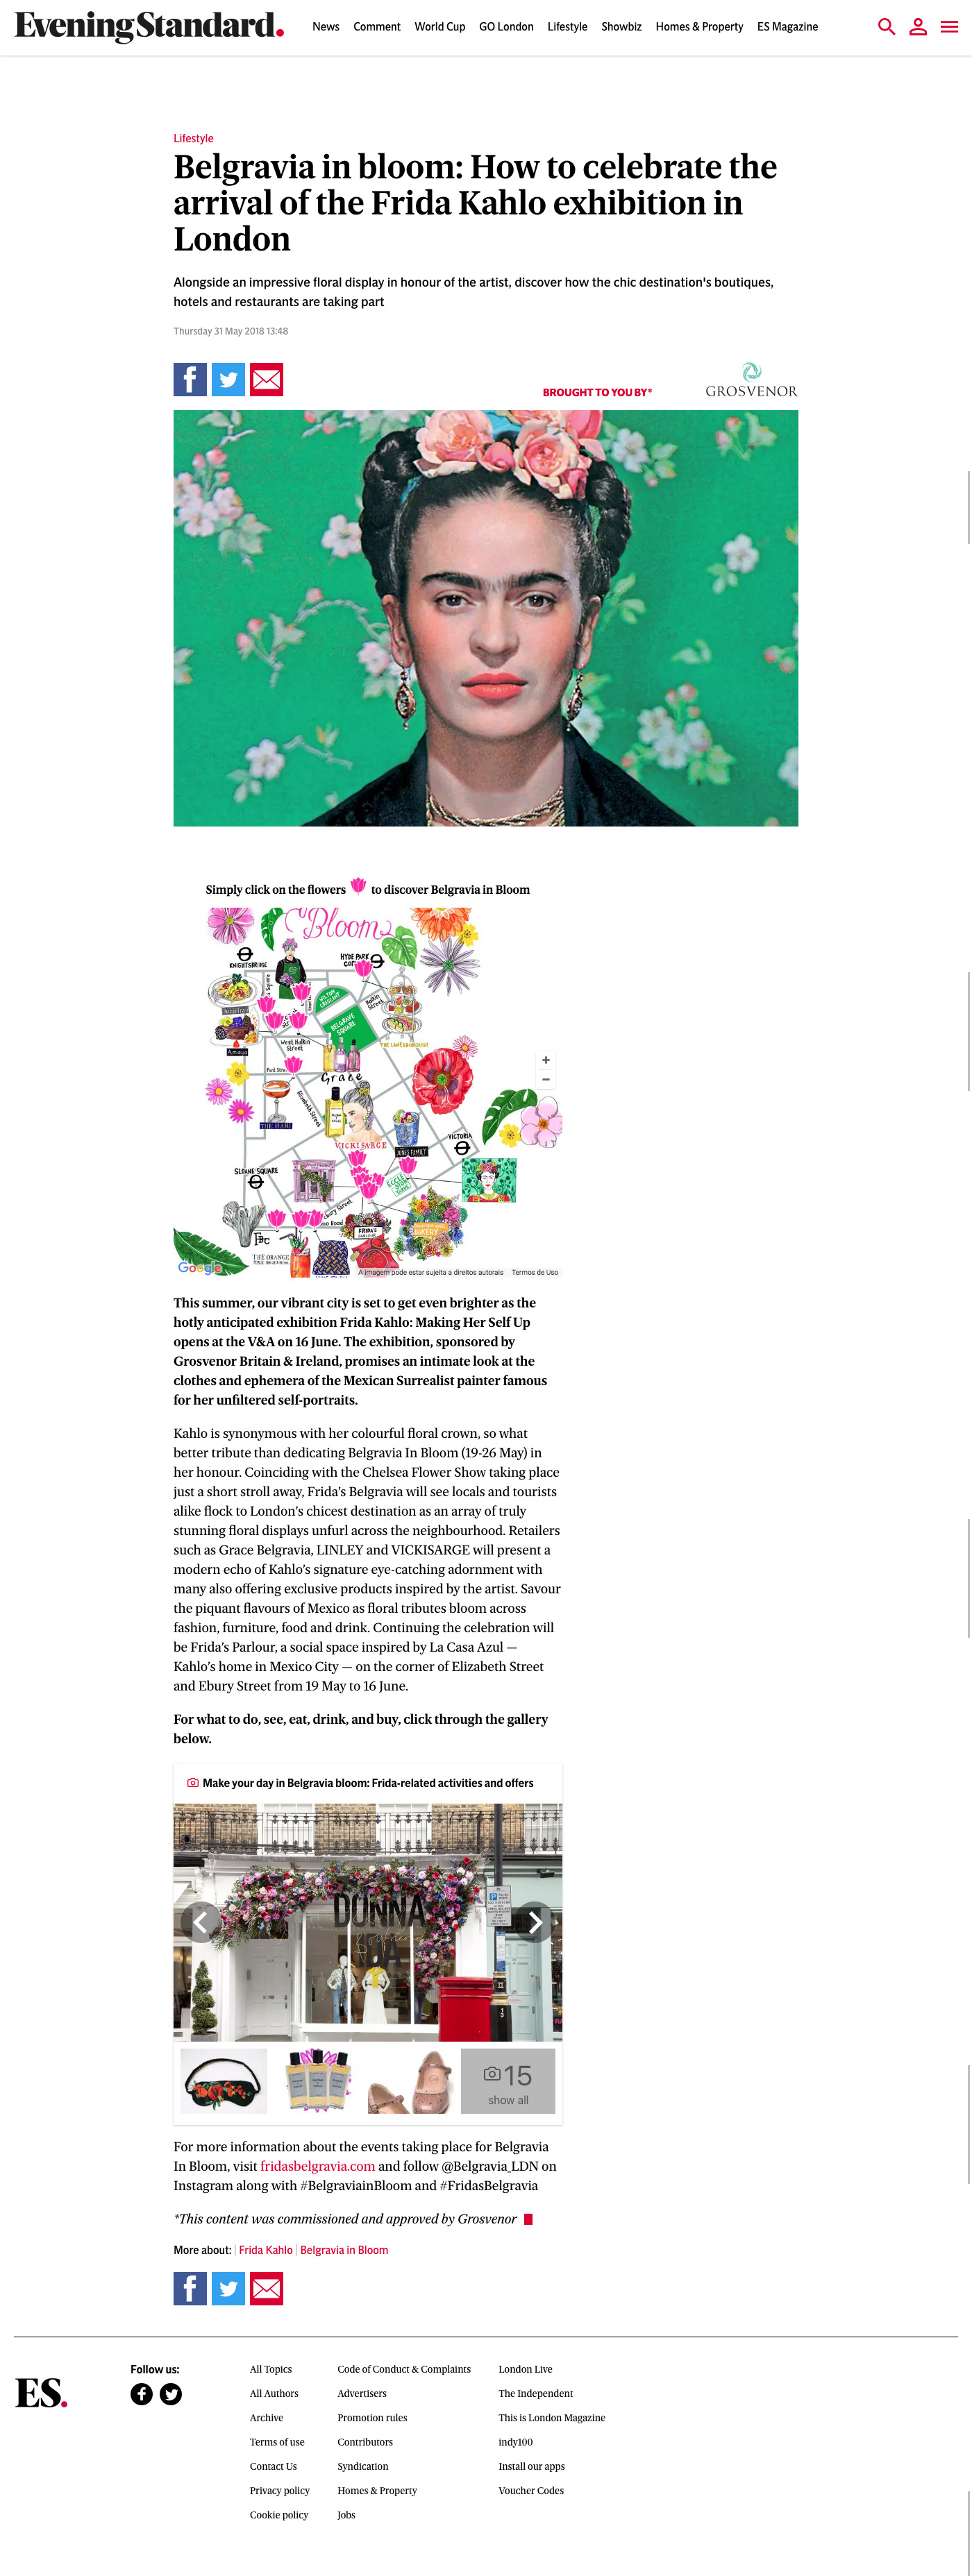 Evening Standard Belgravia in Bloom - Frida Kahlo exhibition map grosvenor interactive map